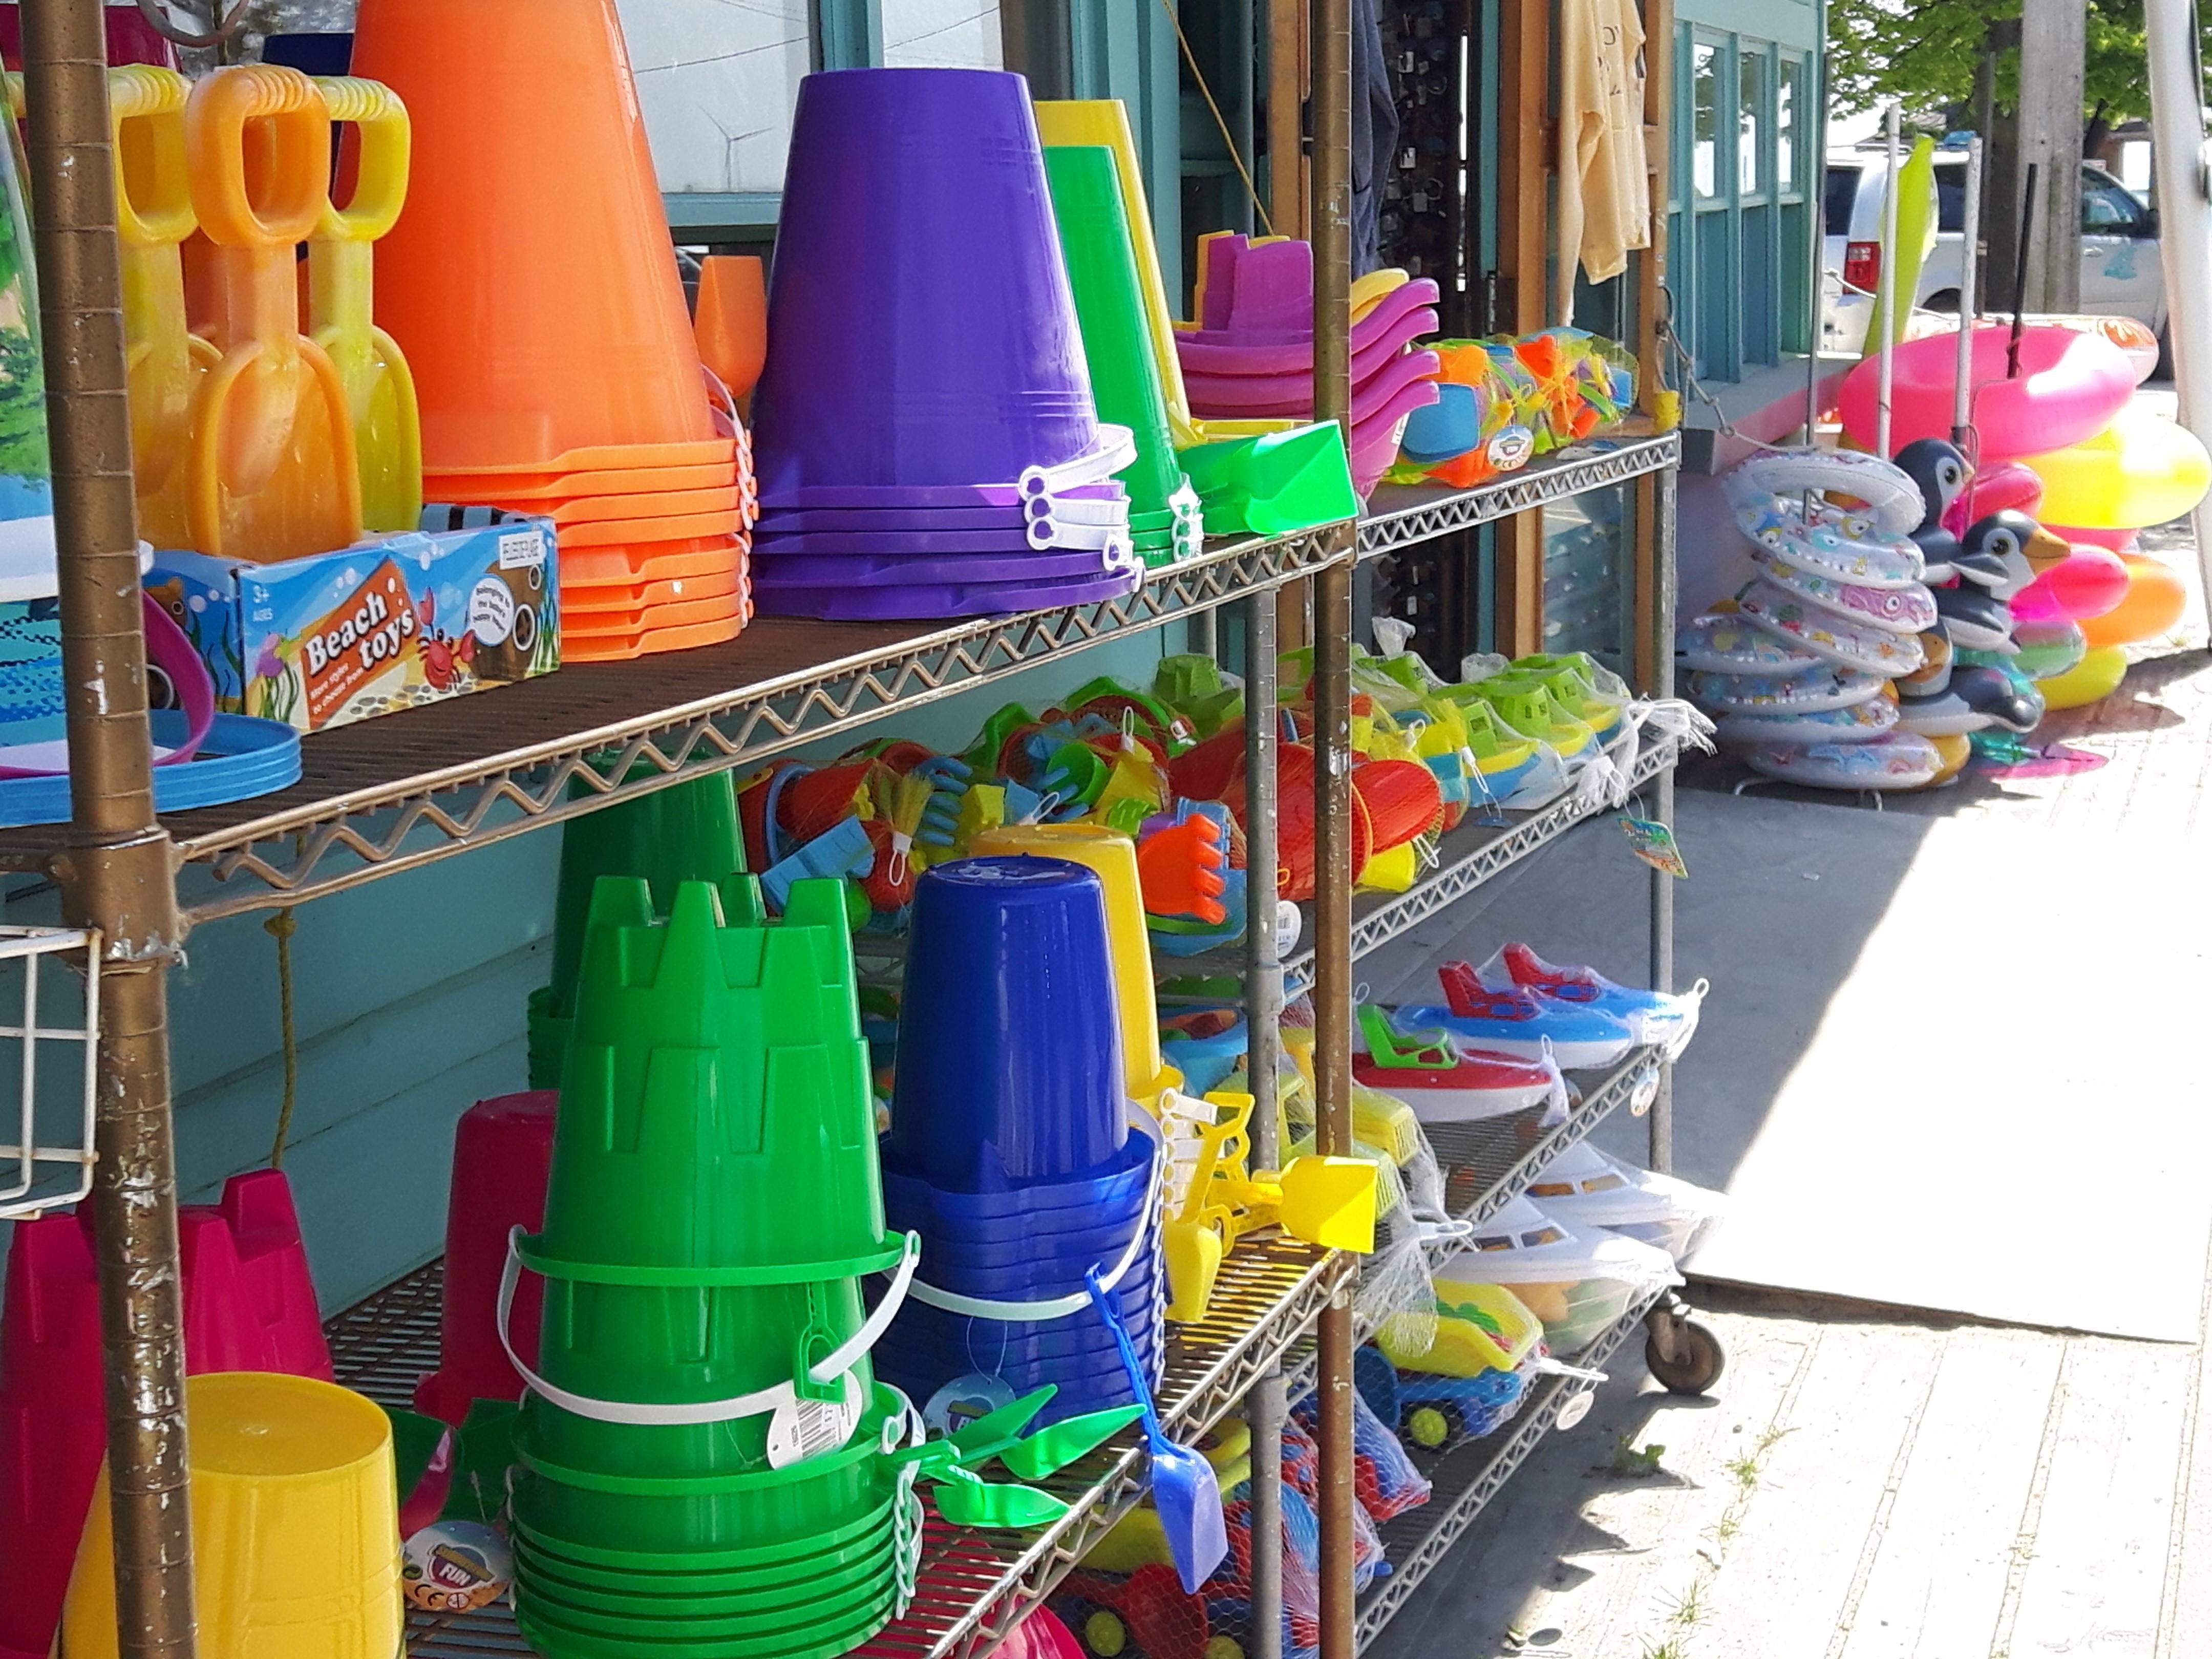 explore-shopping-for-toys-in-port-dover-ontario